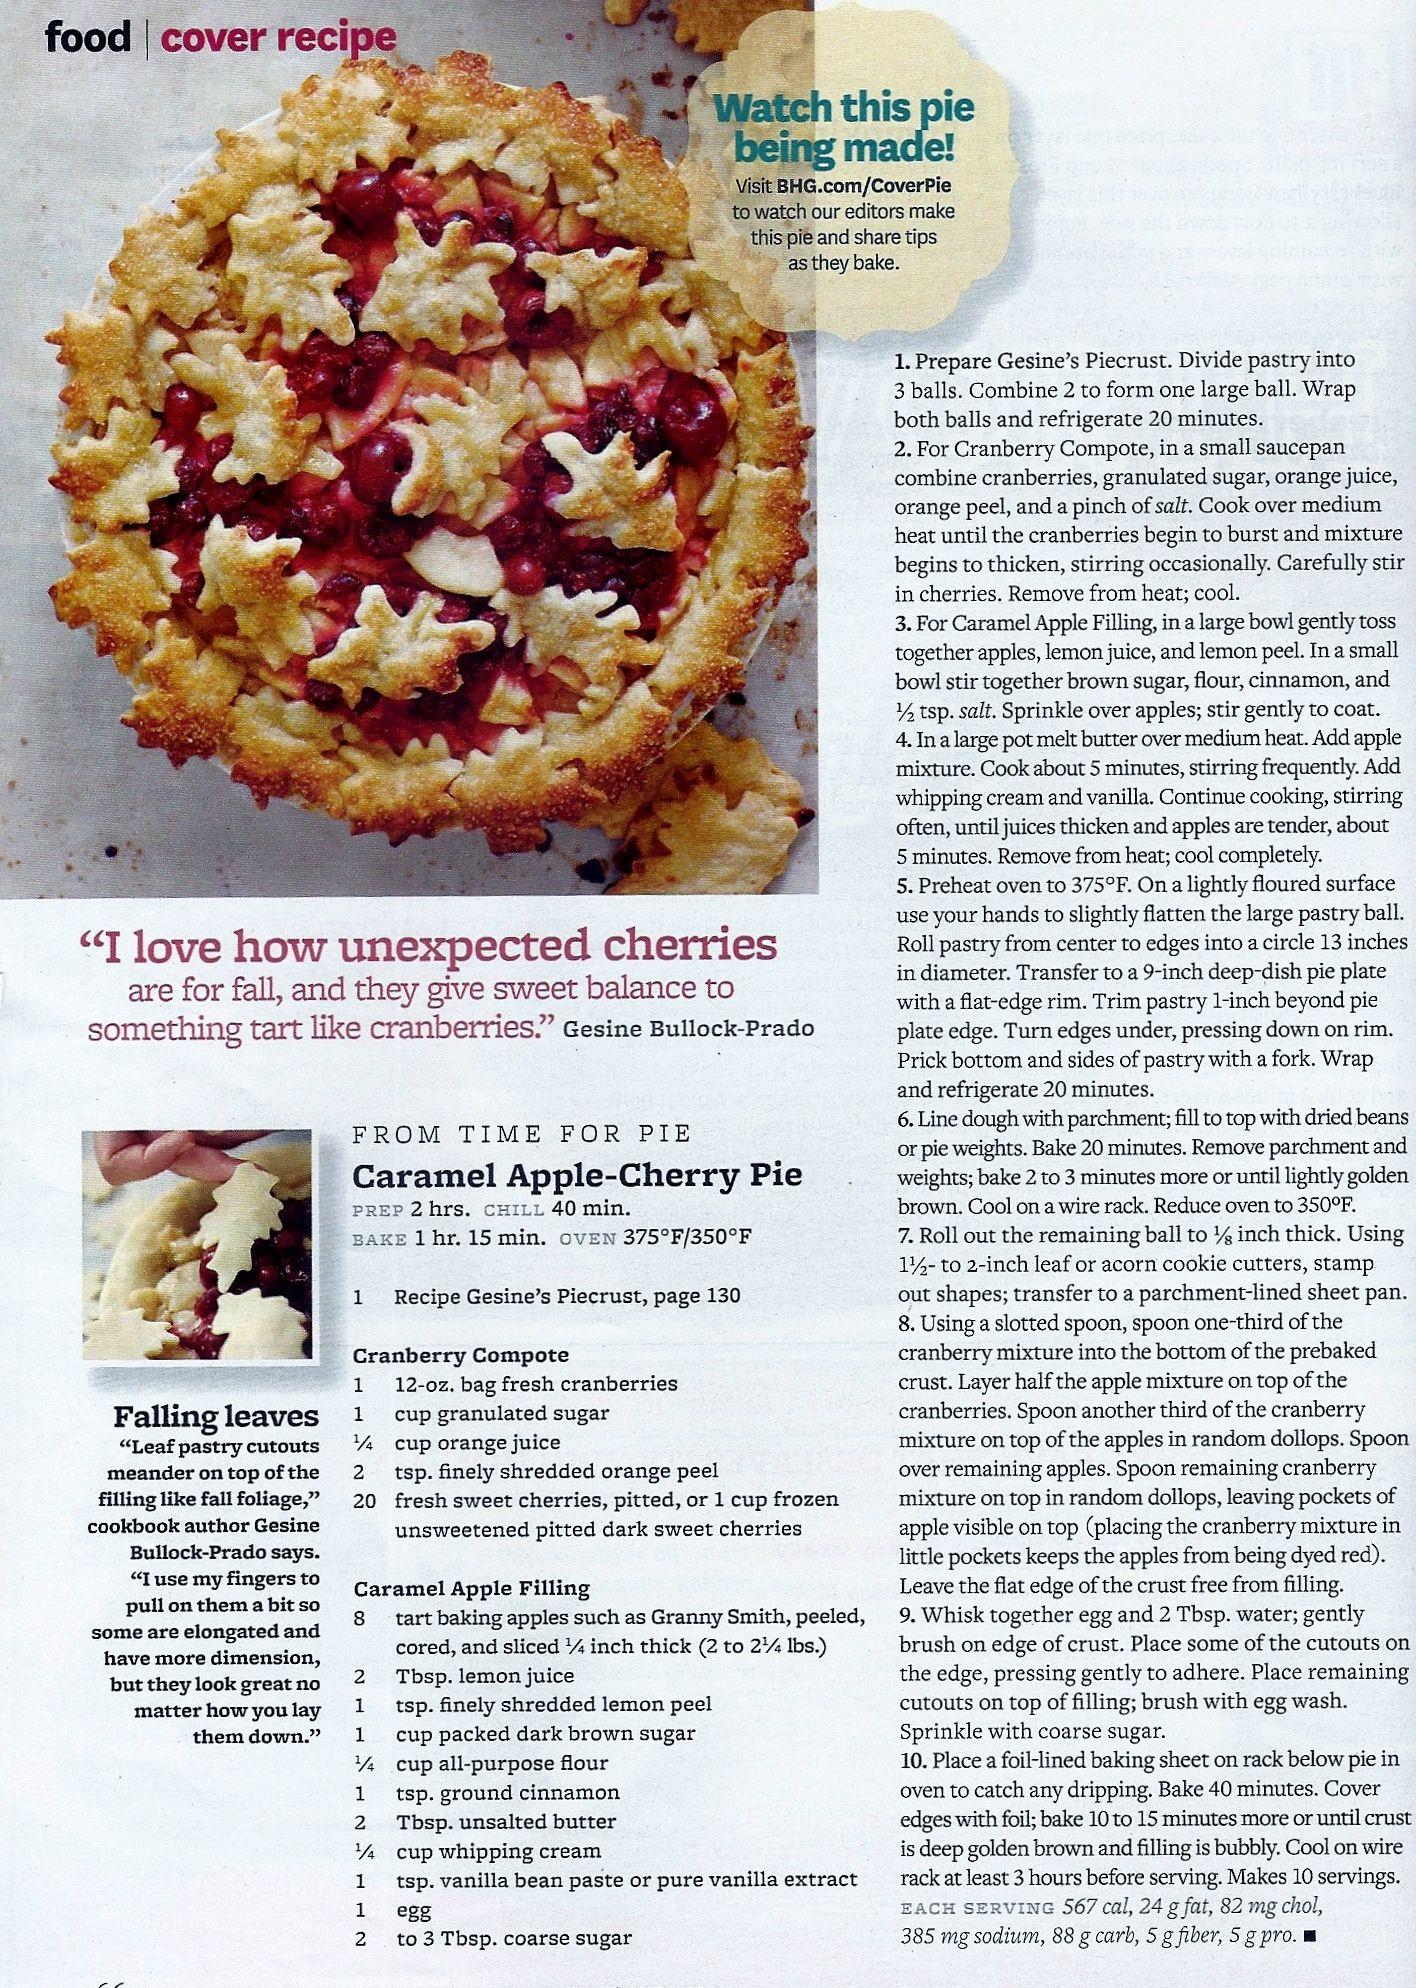 Caramel Apple-Cherry Pie